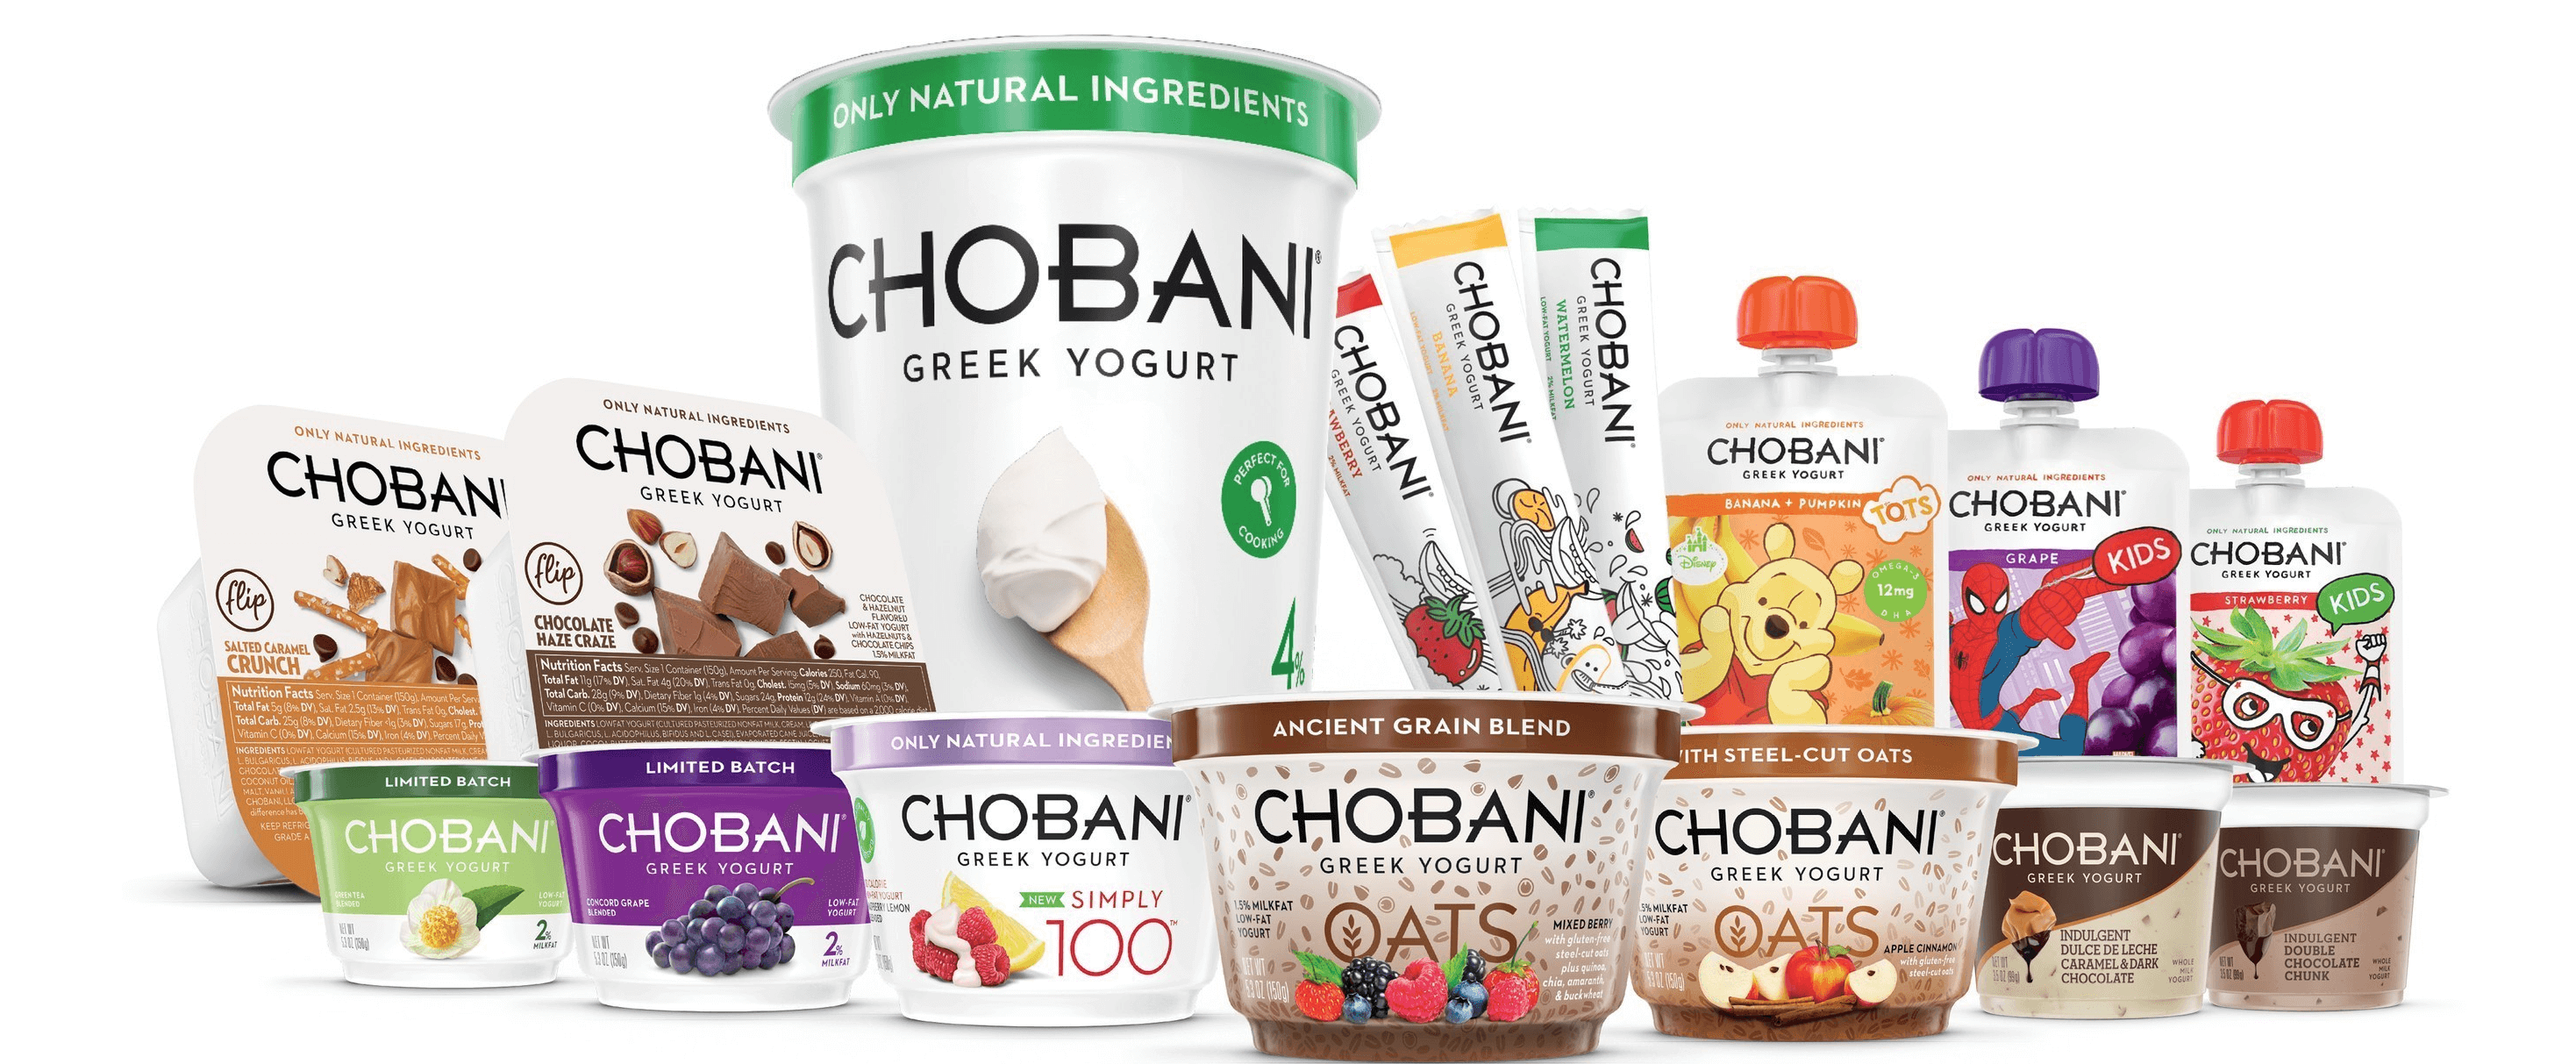 Chobani products.